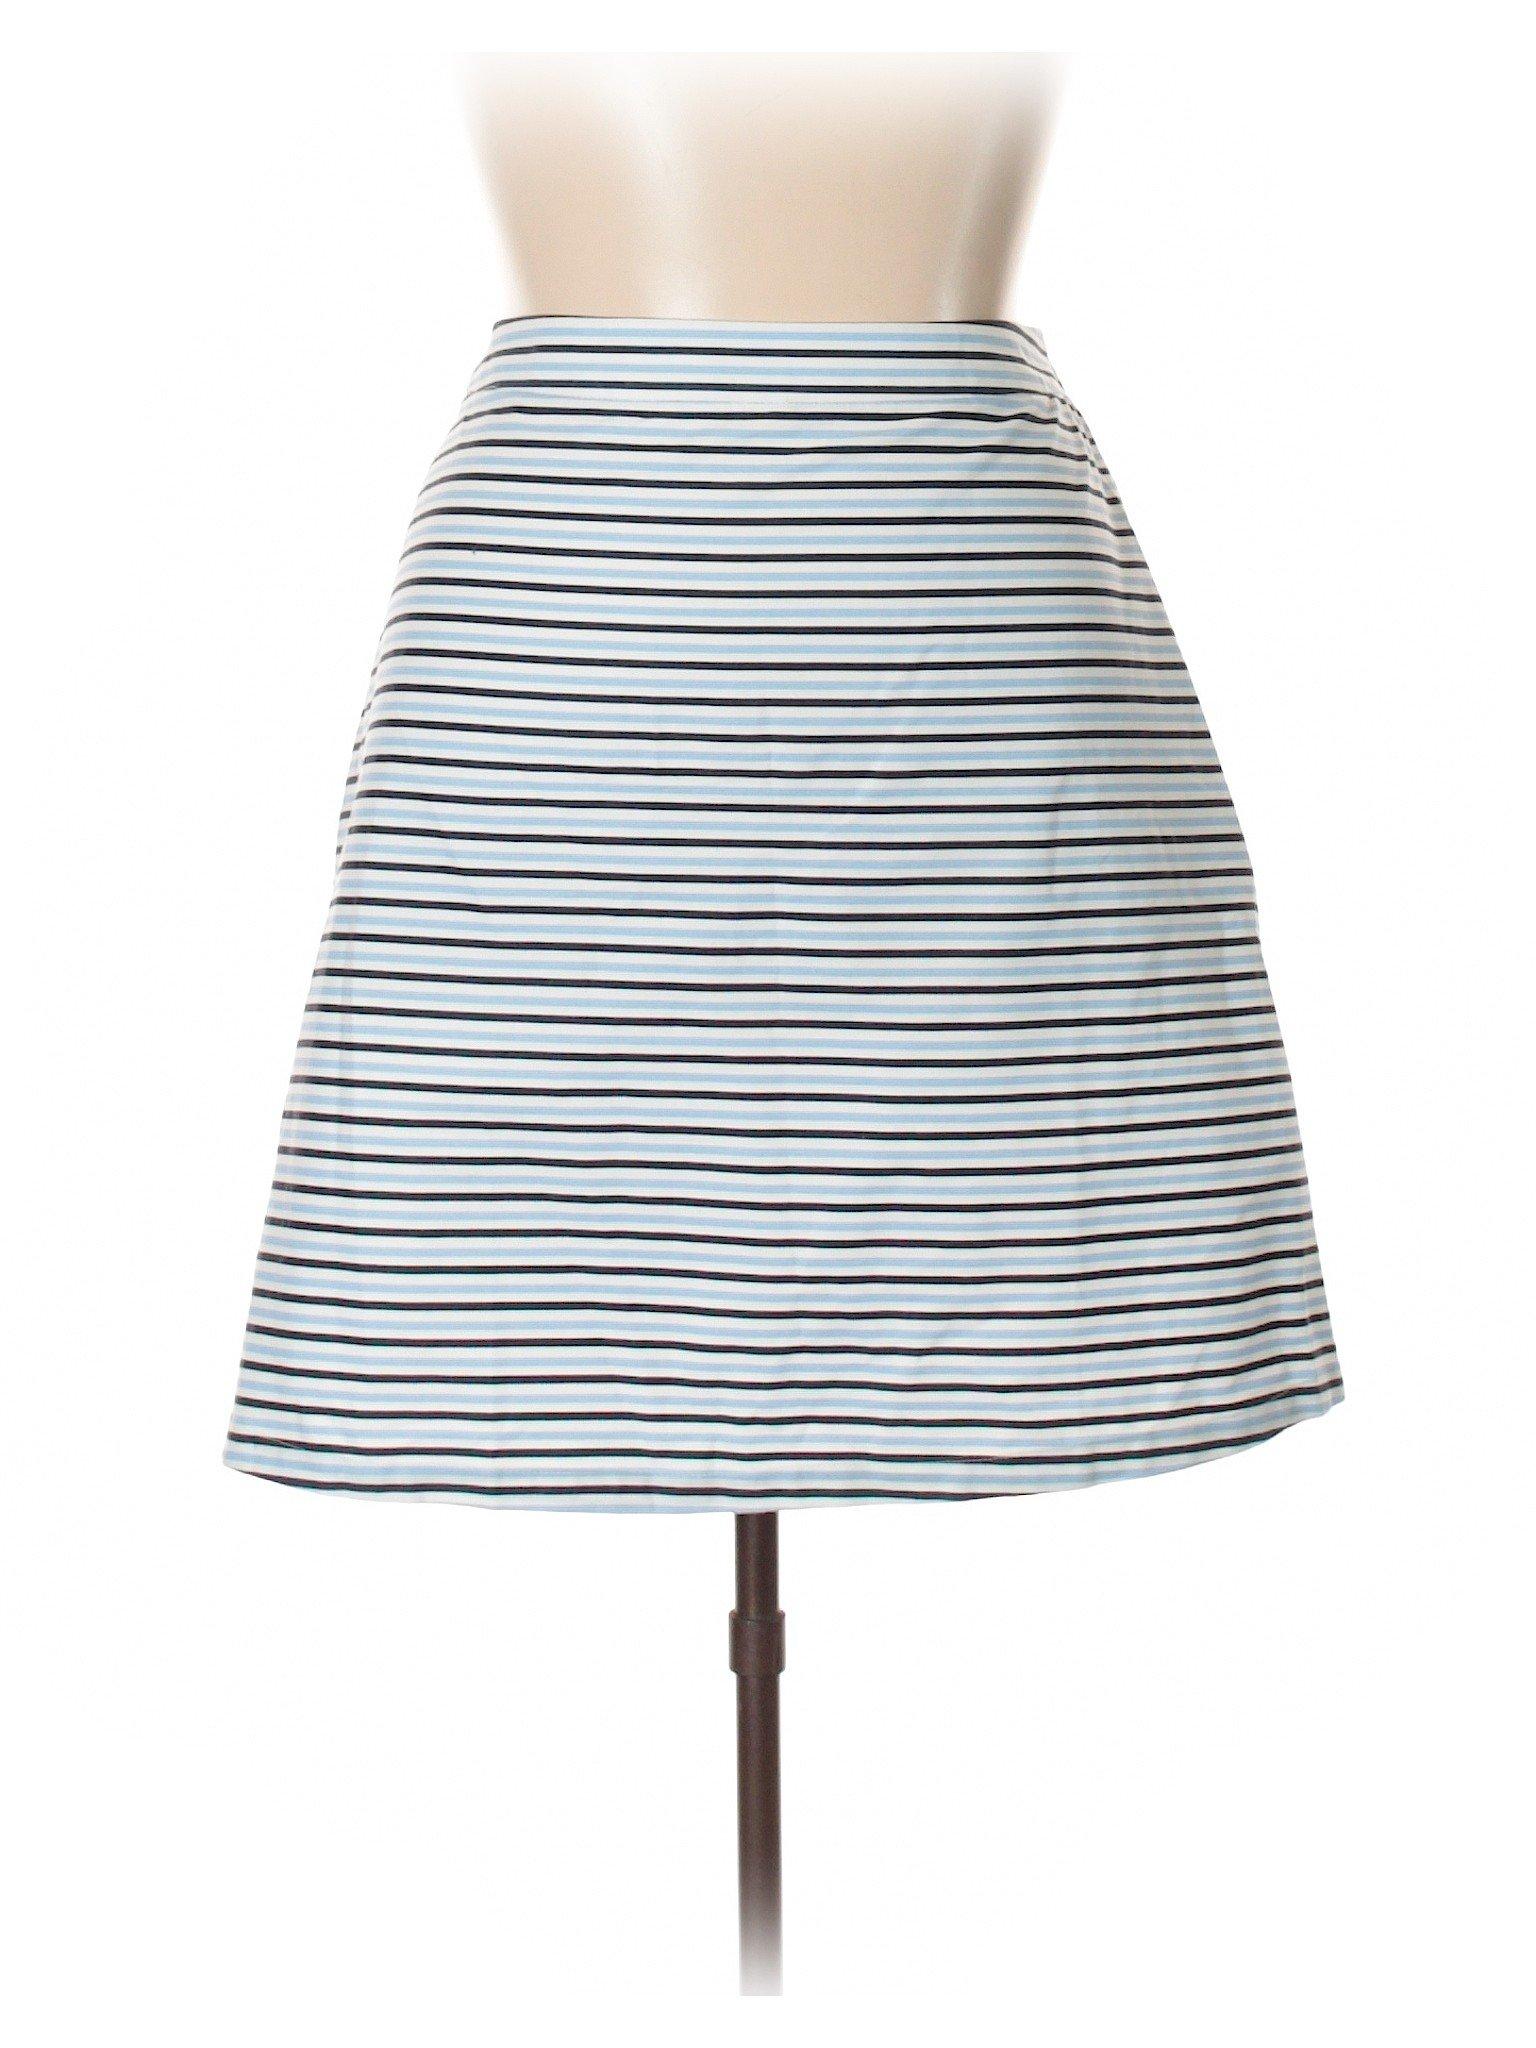 fcc9af36557 Boutique Lane Skirt Boutique Casual Casual Bryant Skirt Lane Bryant rqI7T  ...